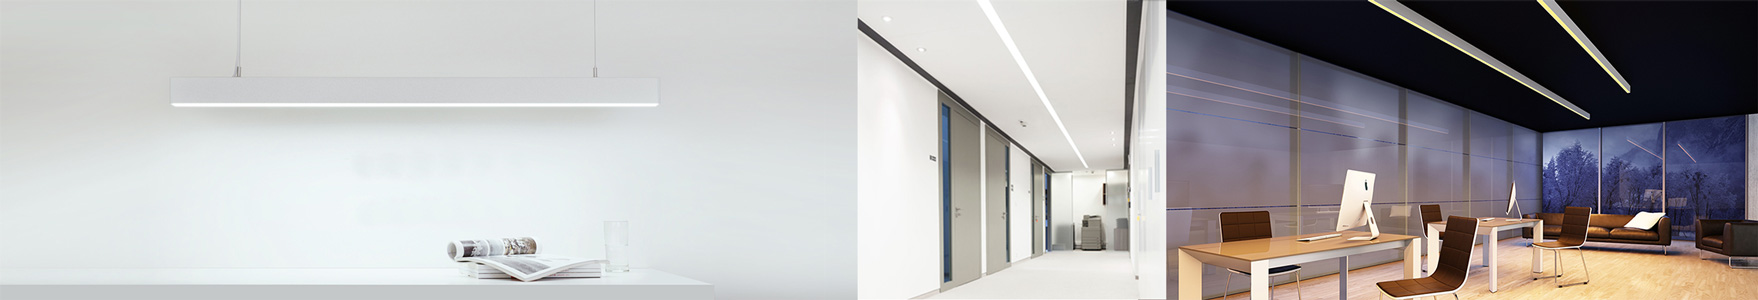 LineM Die LED universelle Lichtbandleuchte